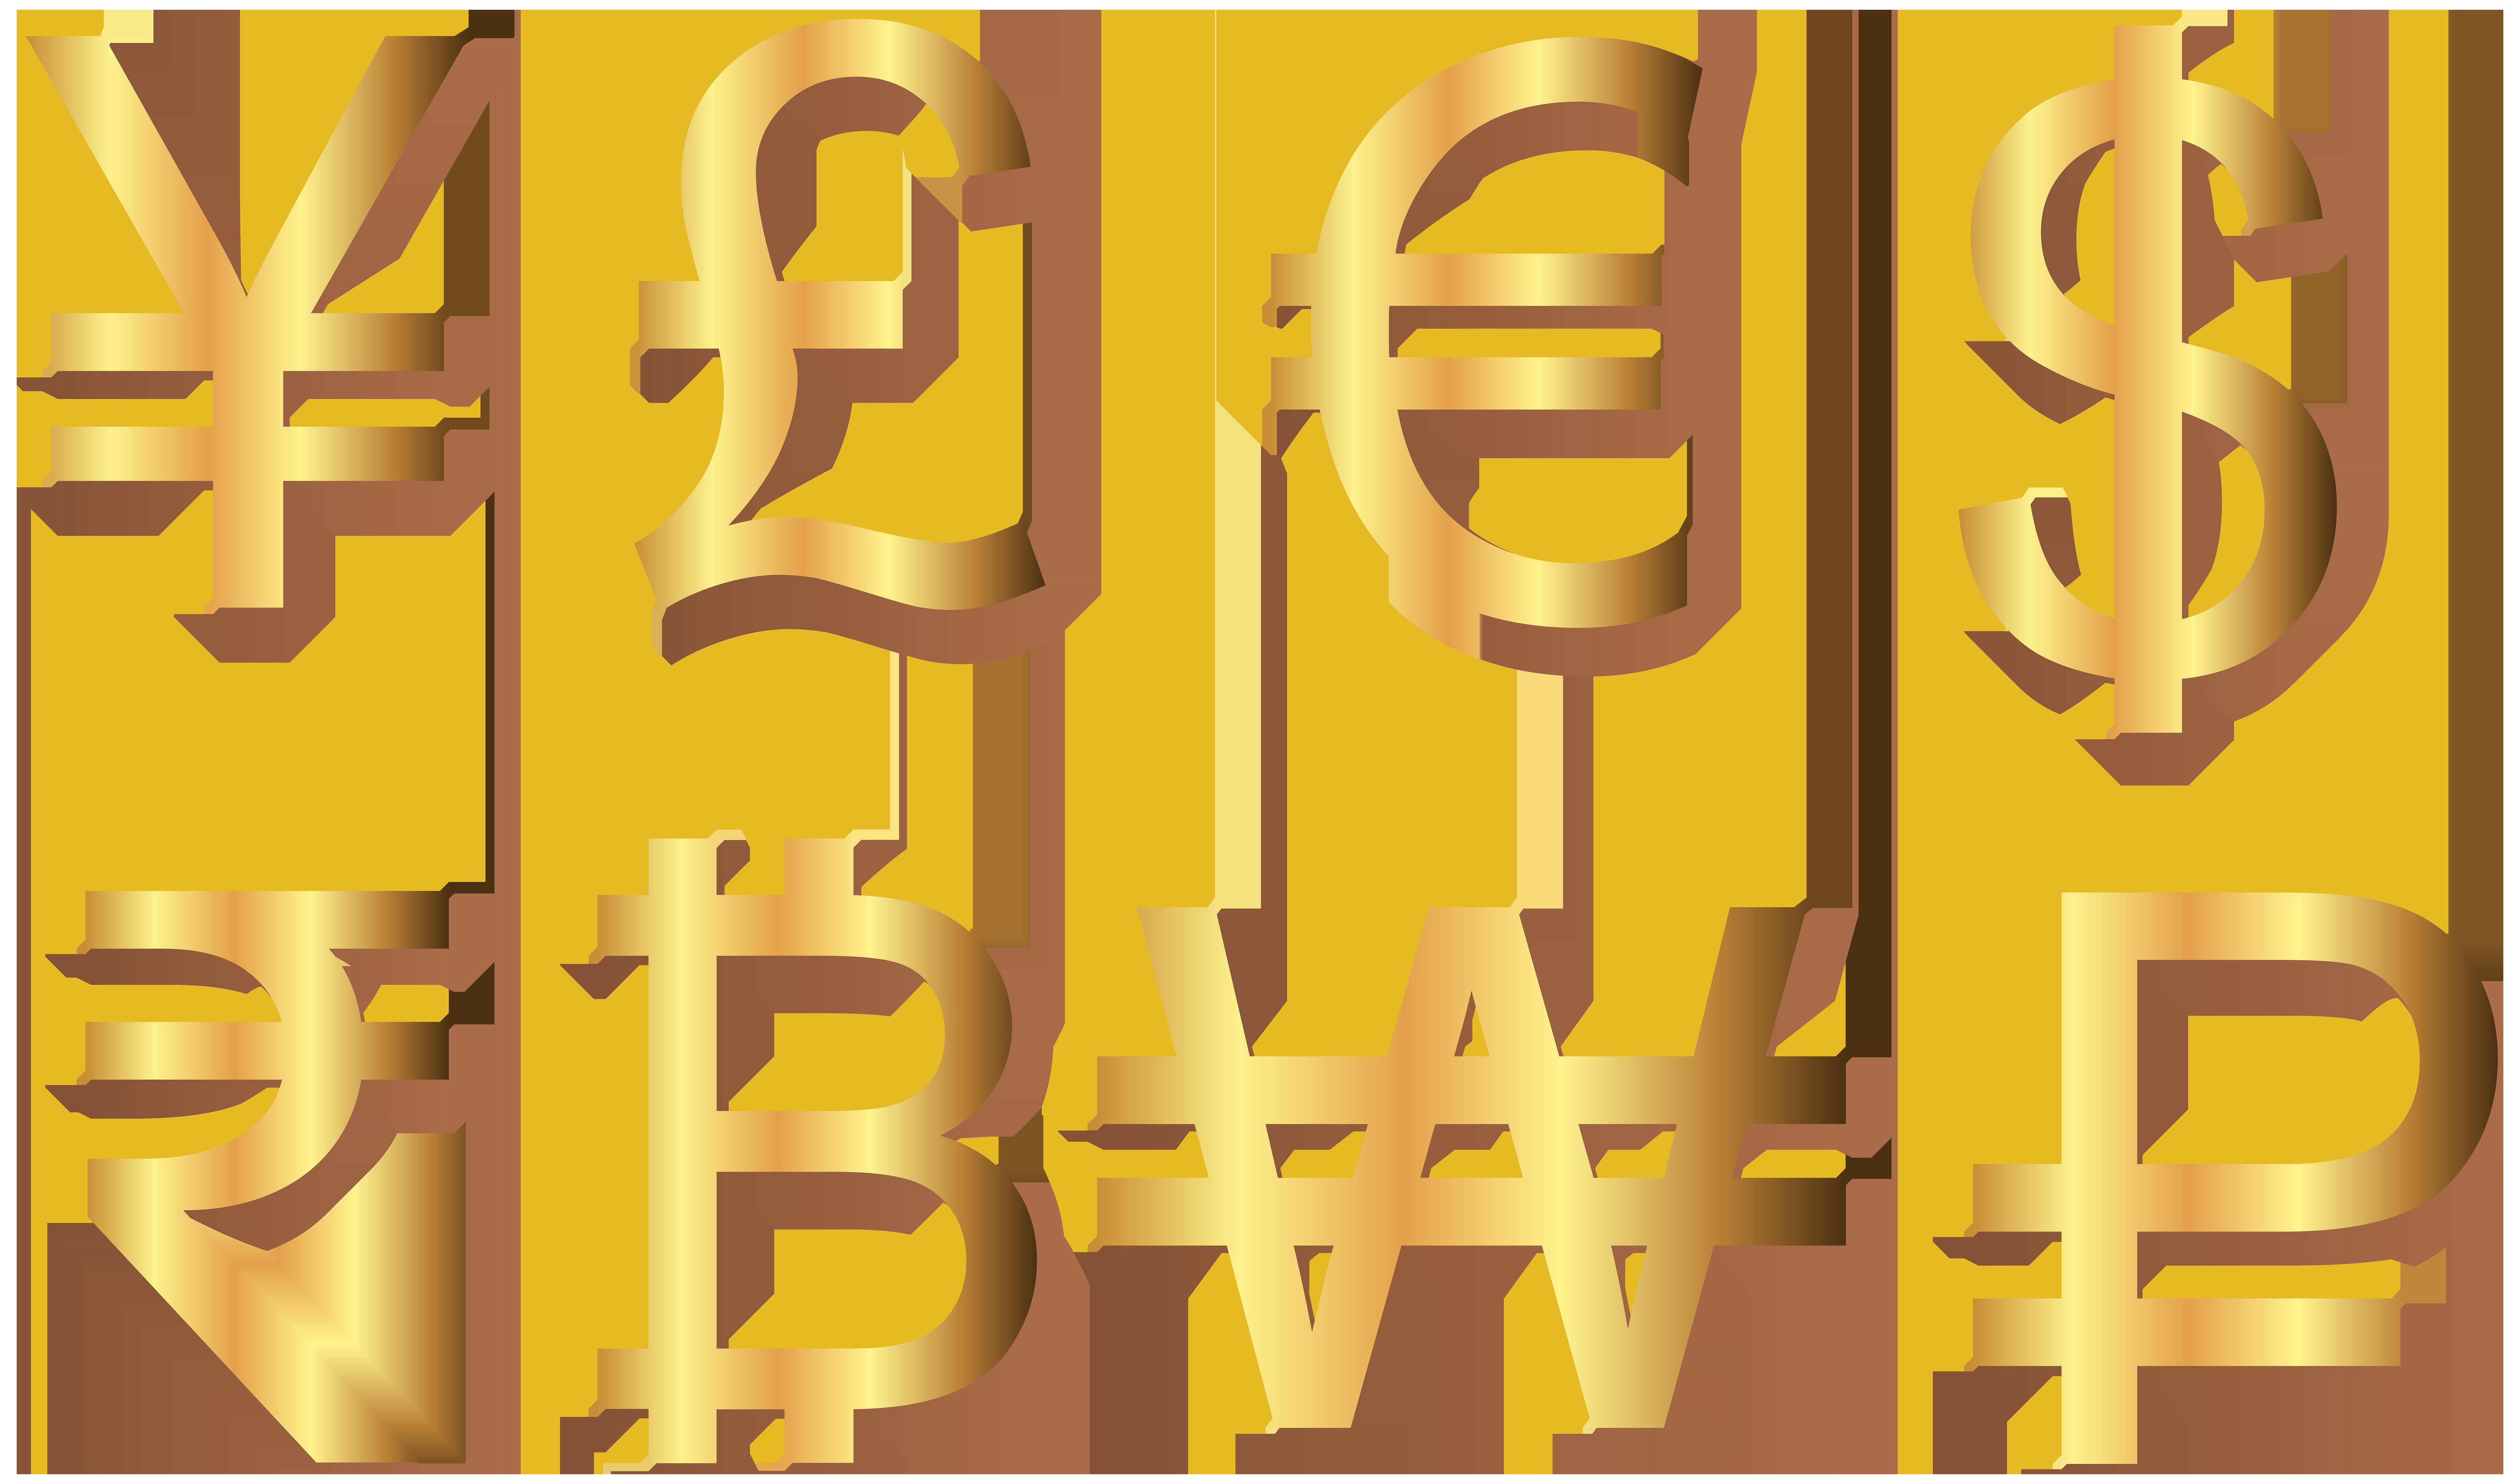 banner transparent stock Banner clipart money. Currency symbols transparent clip.